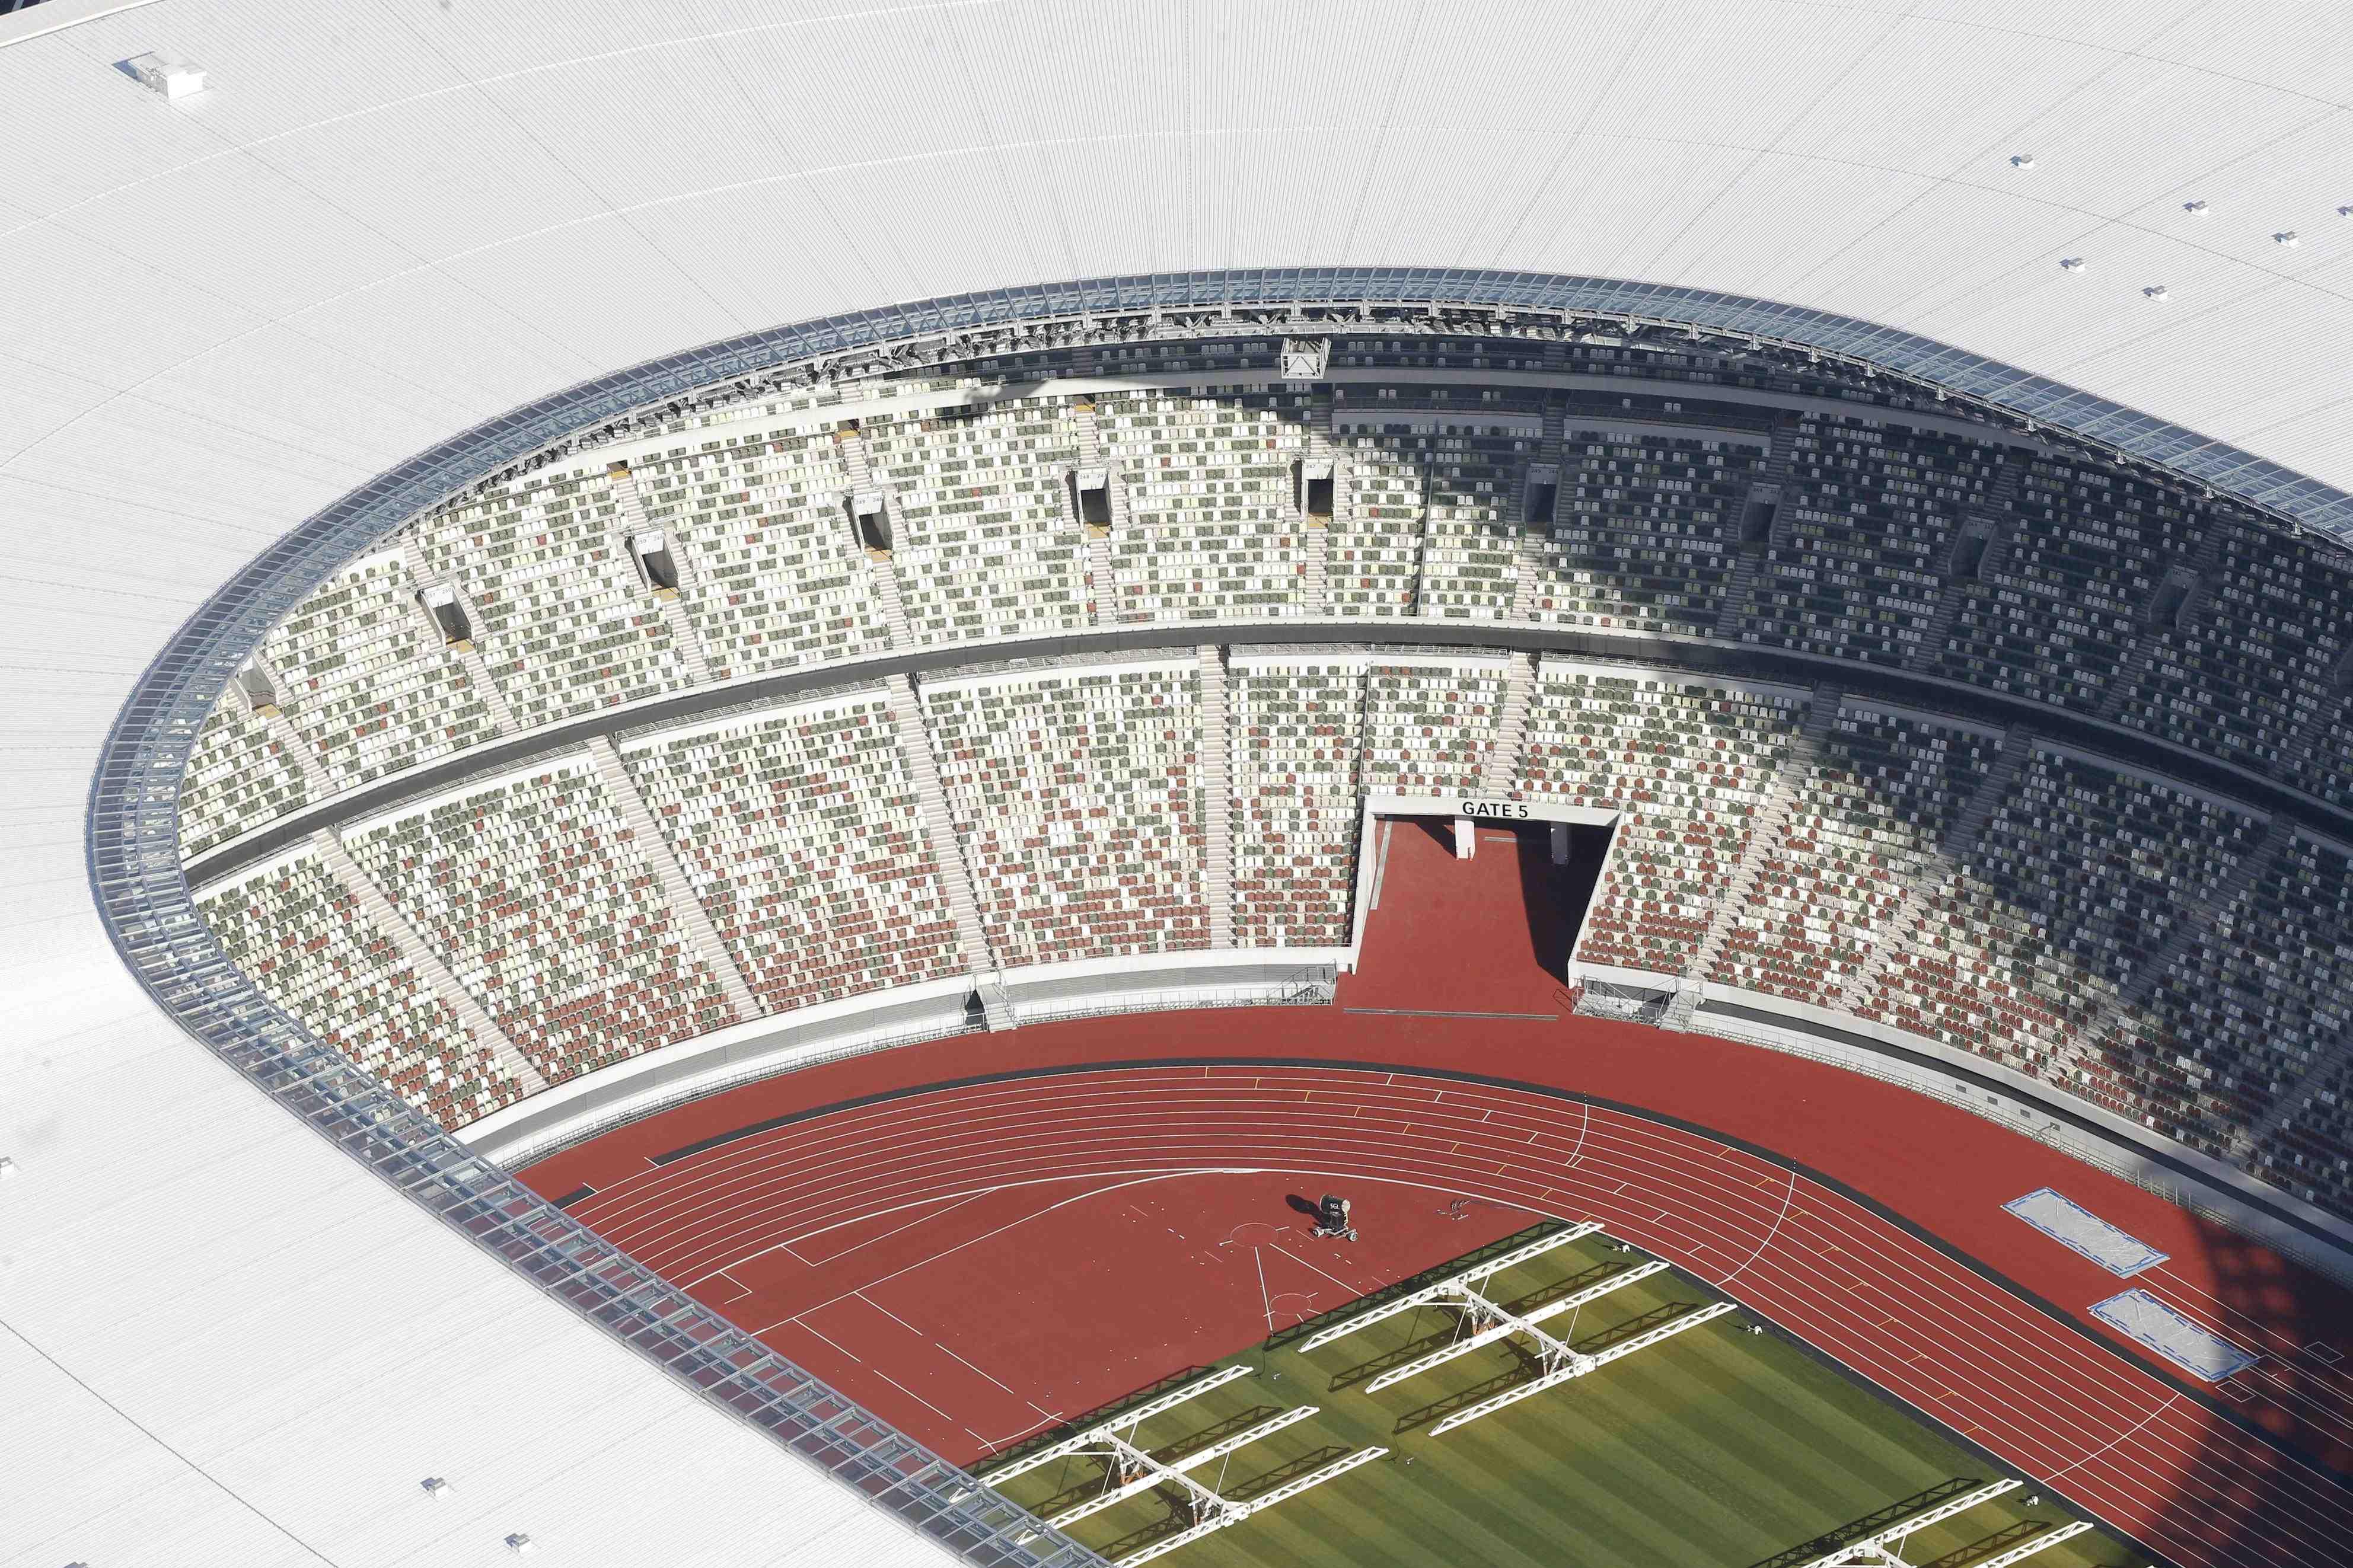 Japan New National Stadium Tokyo Olympics 2020 017